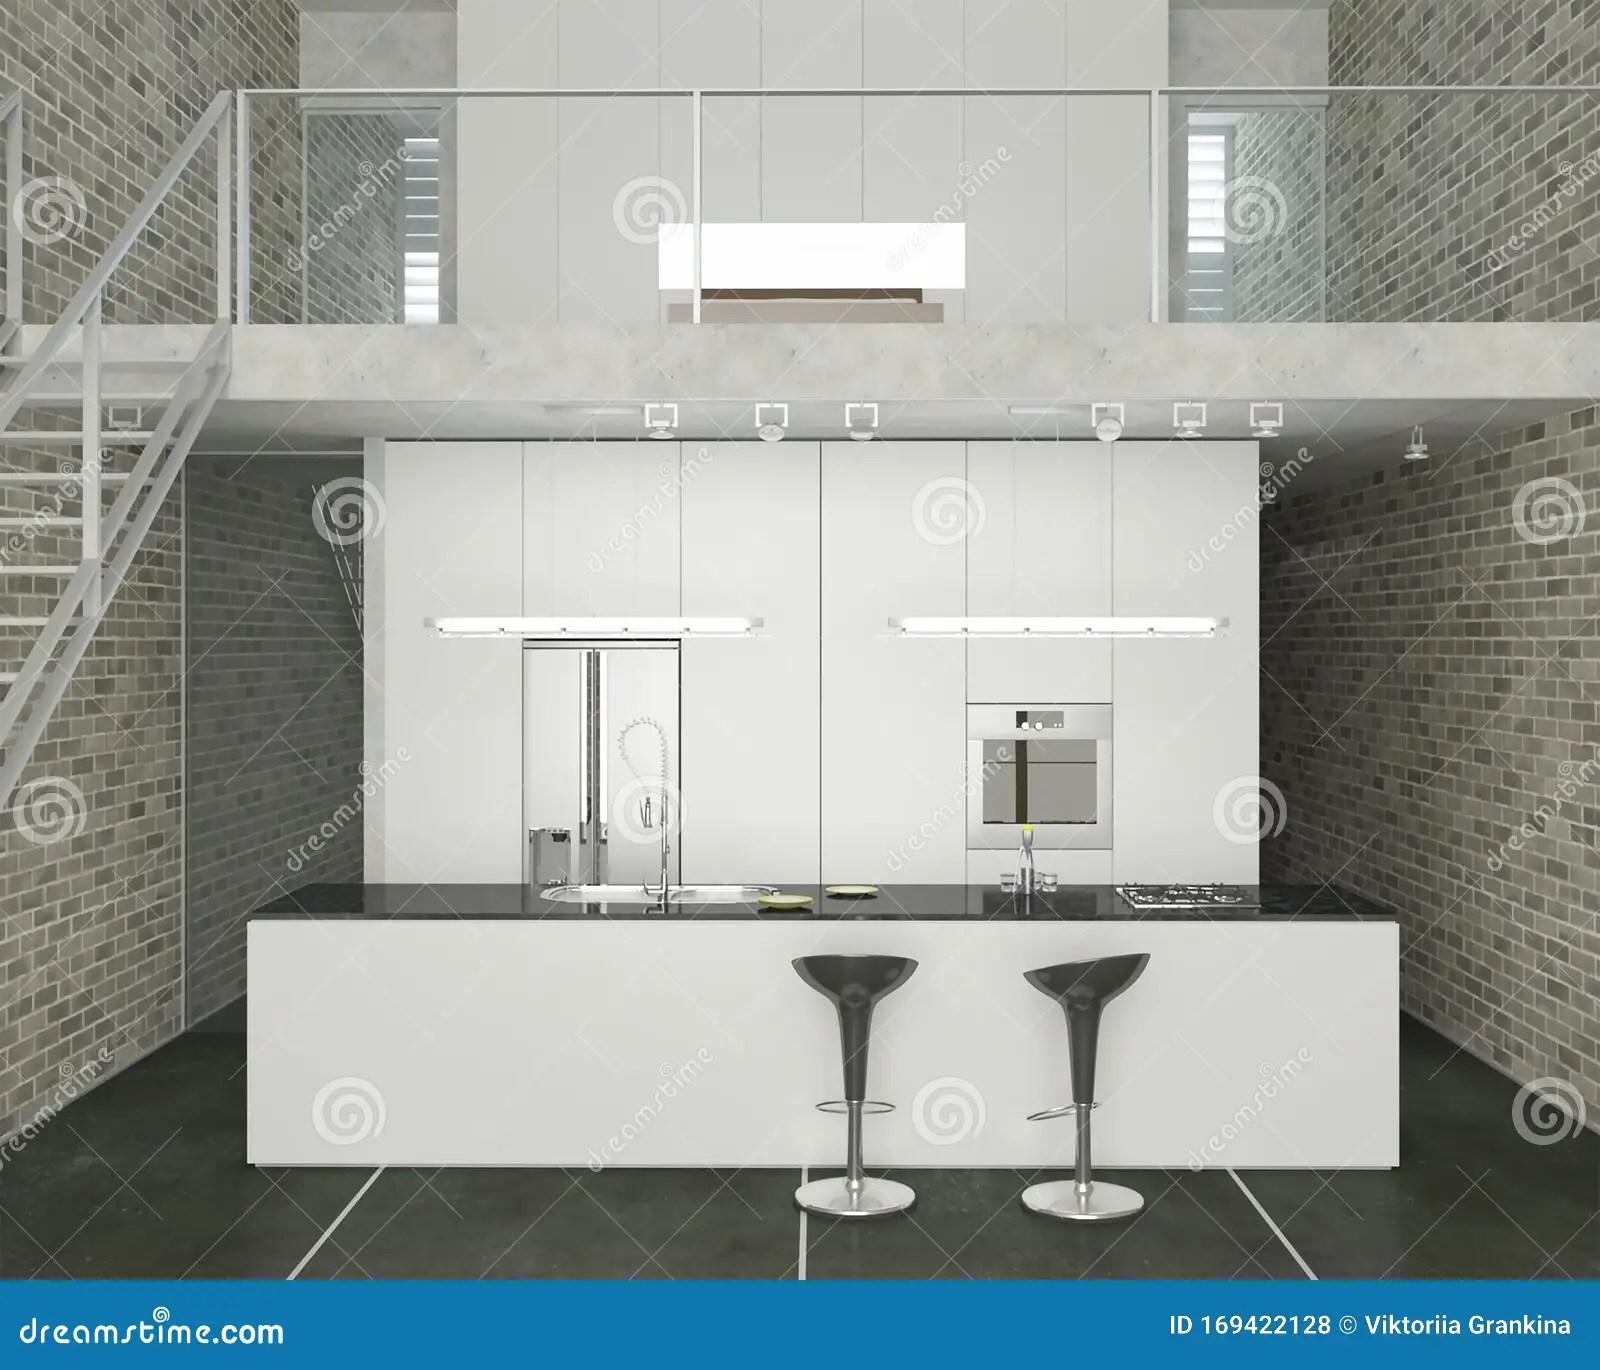 3D Rendering Of Loft Kithcen Interior Design With Second Floor | Second Floor Stairs Design | Floor Plan | Hall | 1St Floor Veranda | Outside | Most Beautiful